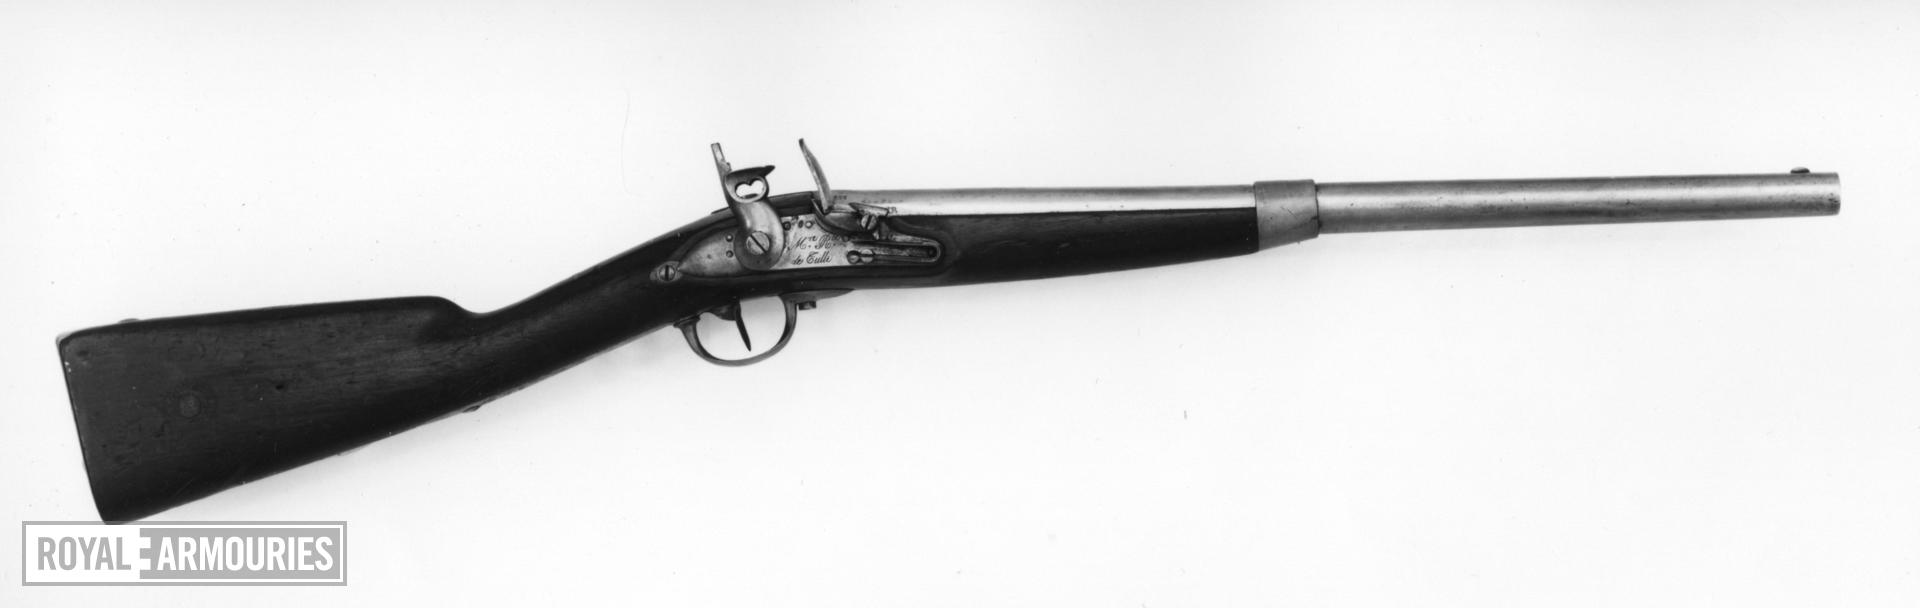 Flintlock military carbine - Model 1822